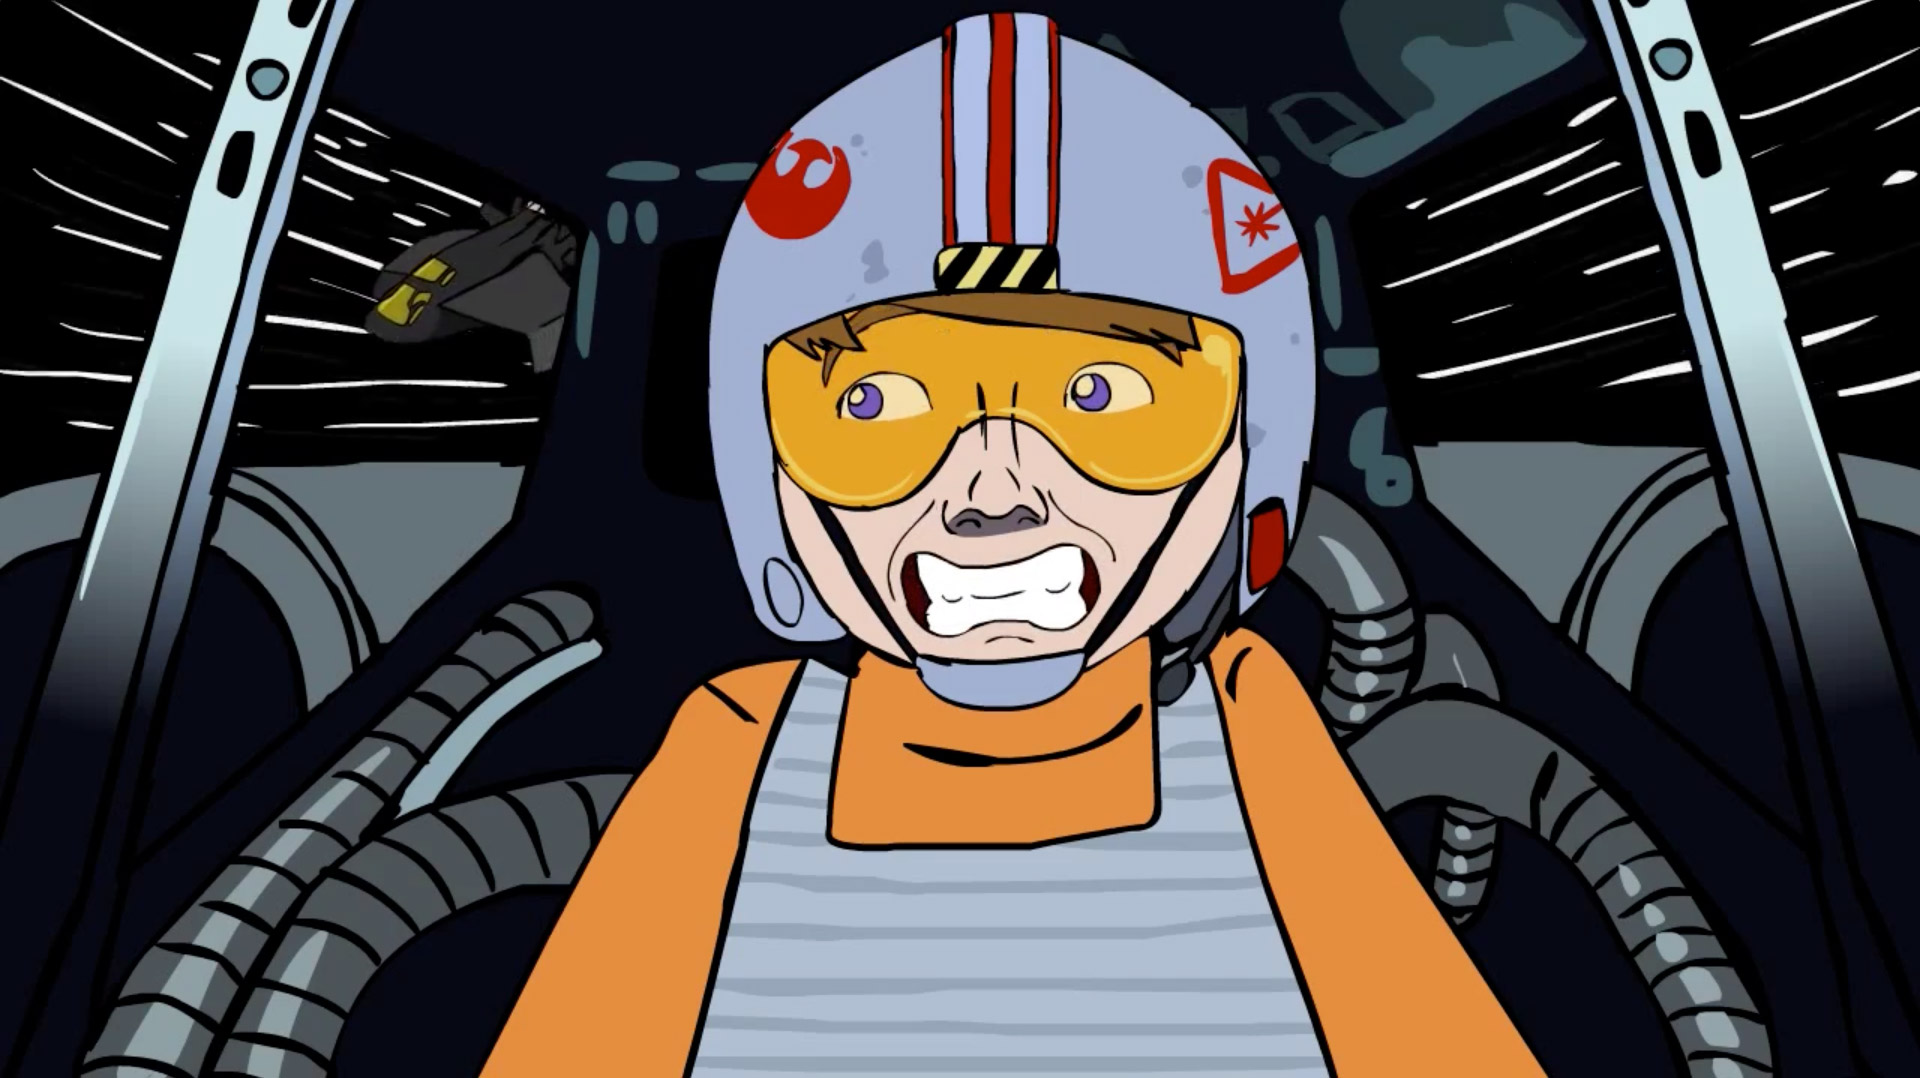 patton-oswalts-star-wars-fillbuster-gets-animated-19.jpg